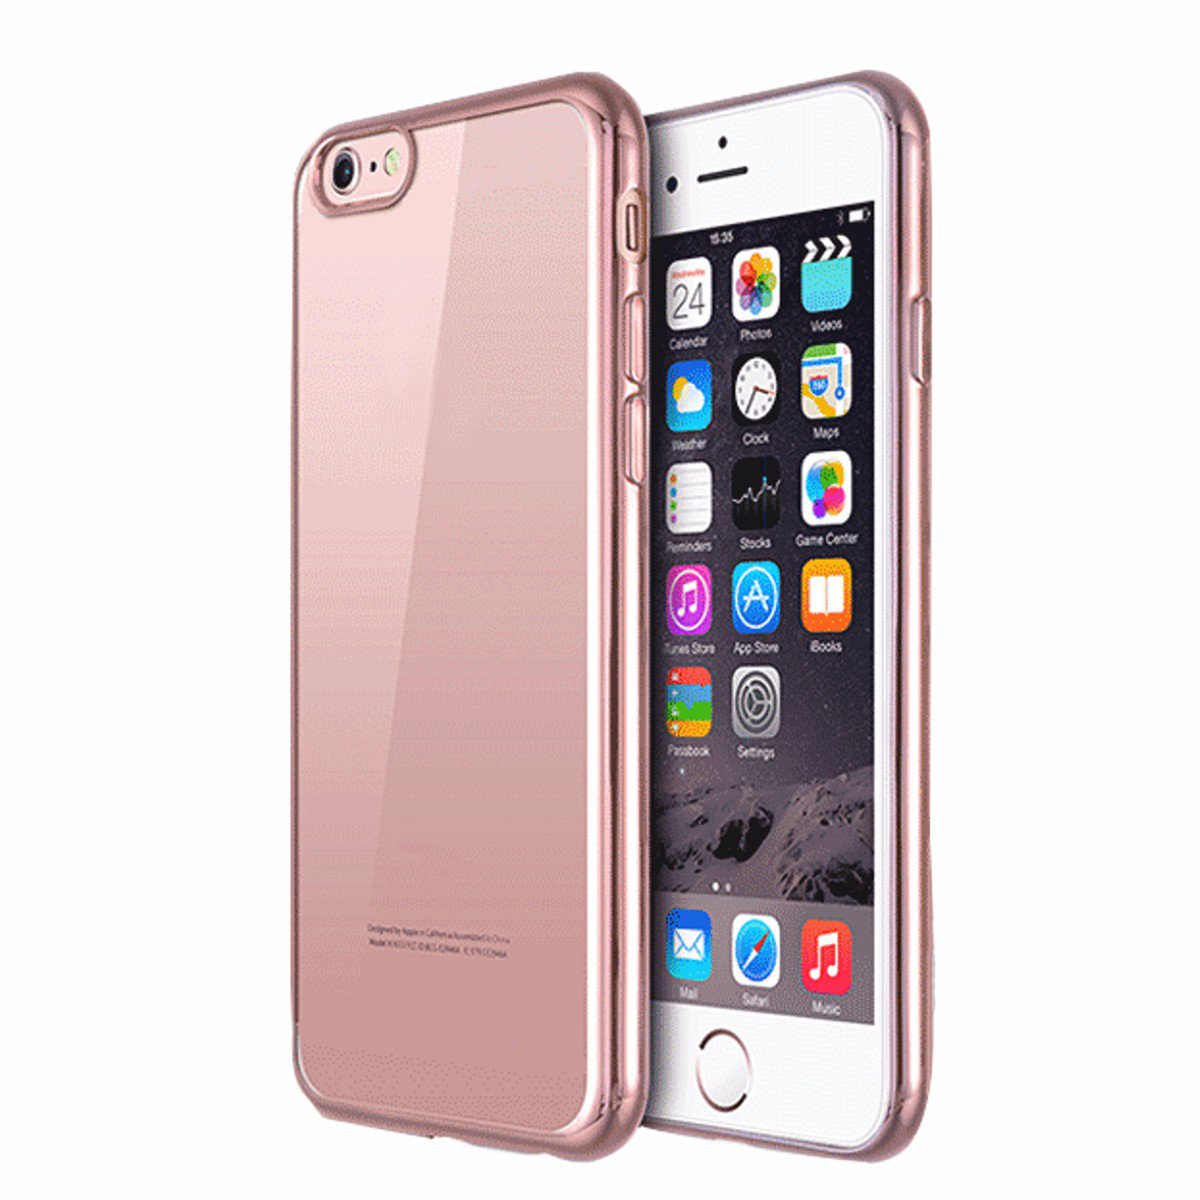 For iPhone 7/7 Plus Ultra Slim Clear Soft TPU Gel Shockproof Back  Rose Gold Case Cover Skin